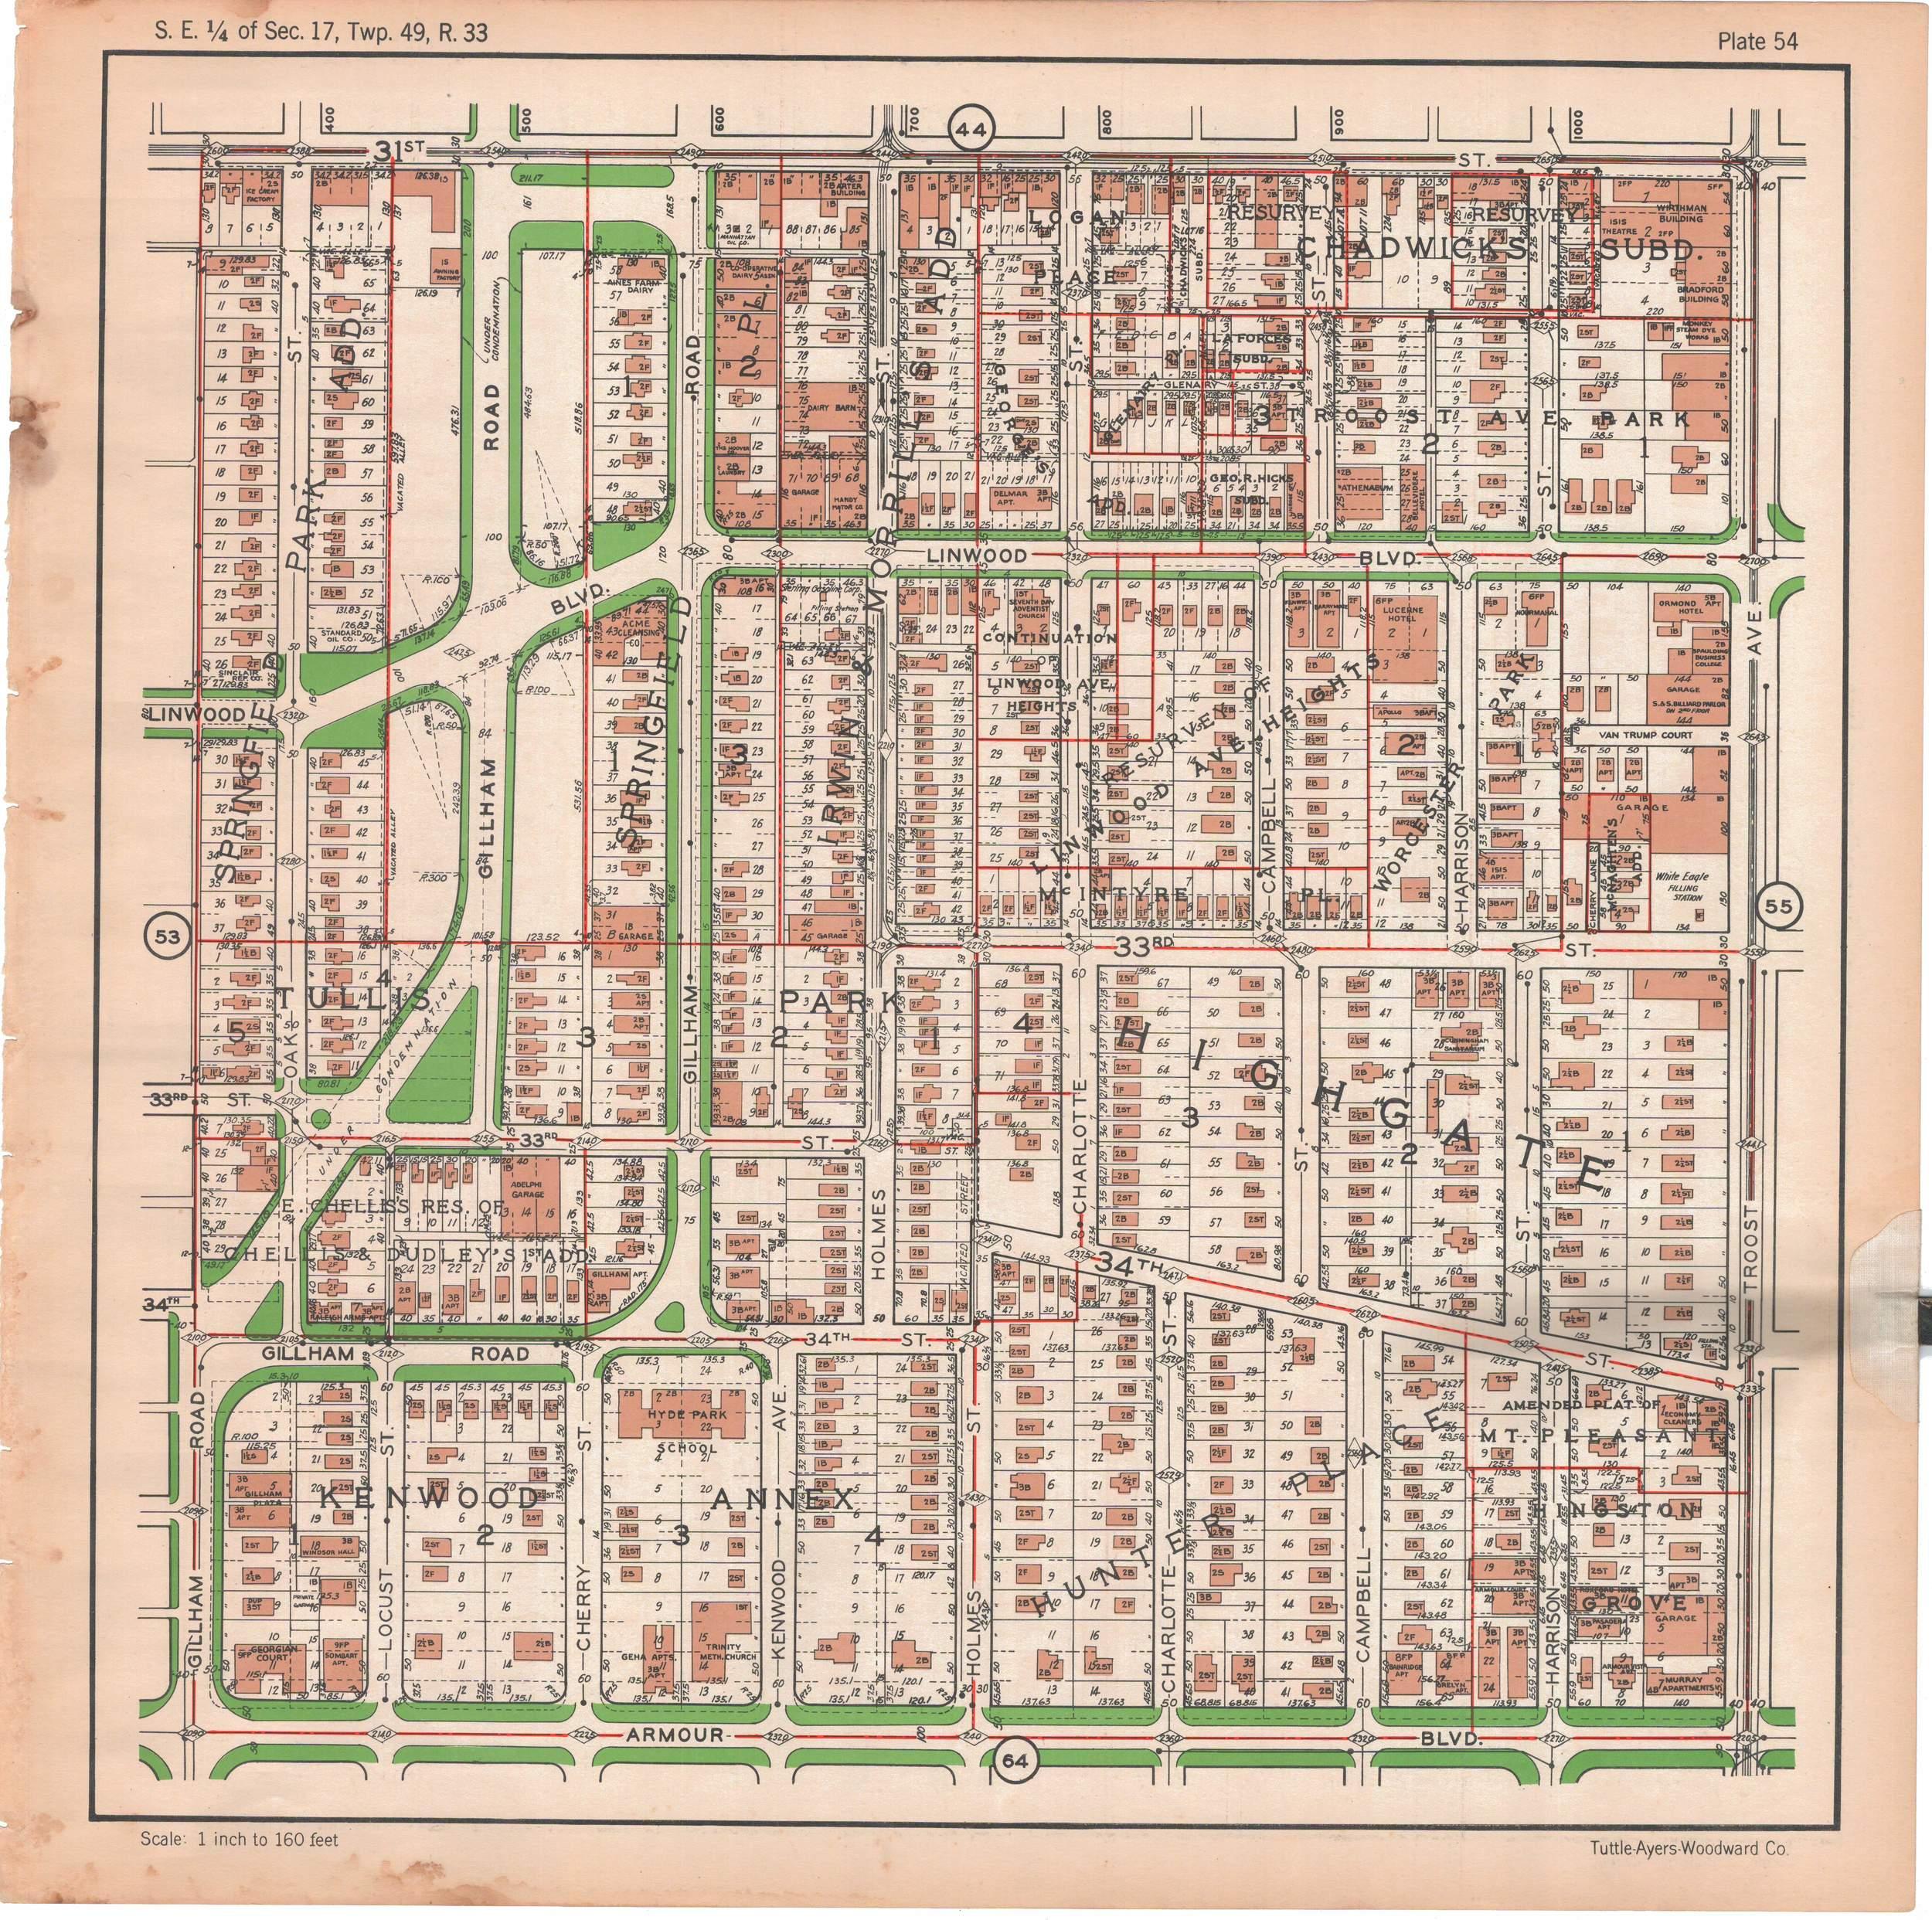 1925 TUTTLE_AYERS_Plate 54.JPG